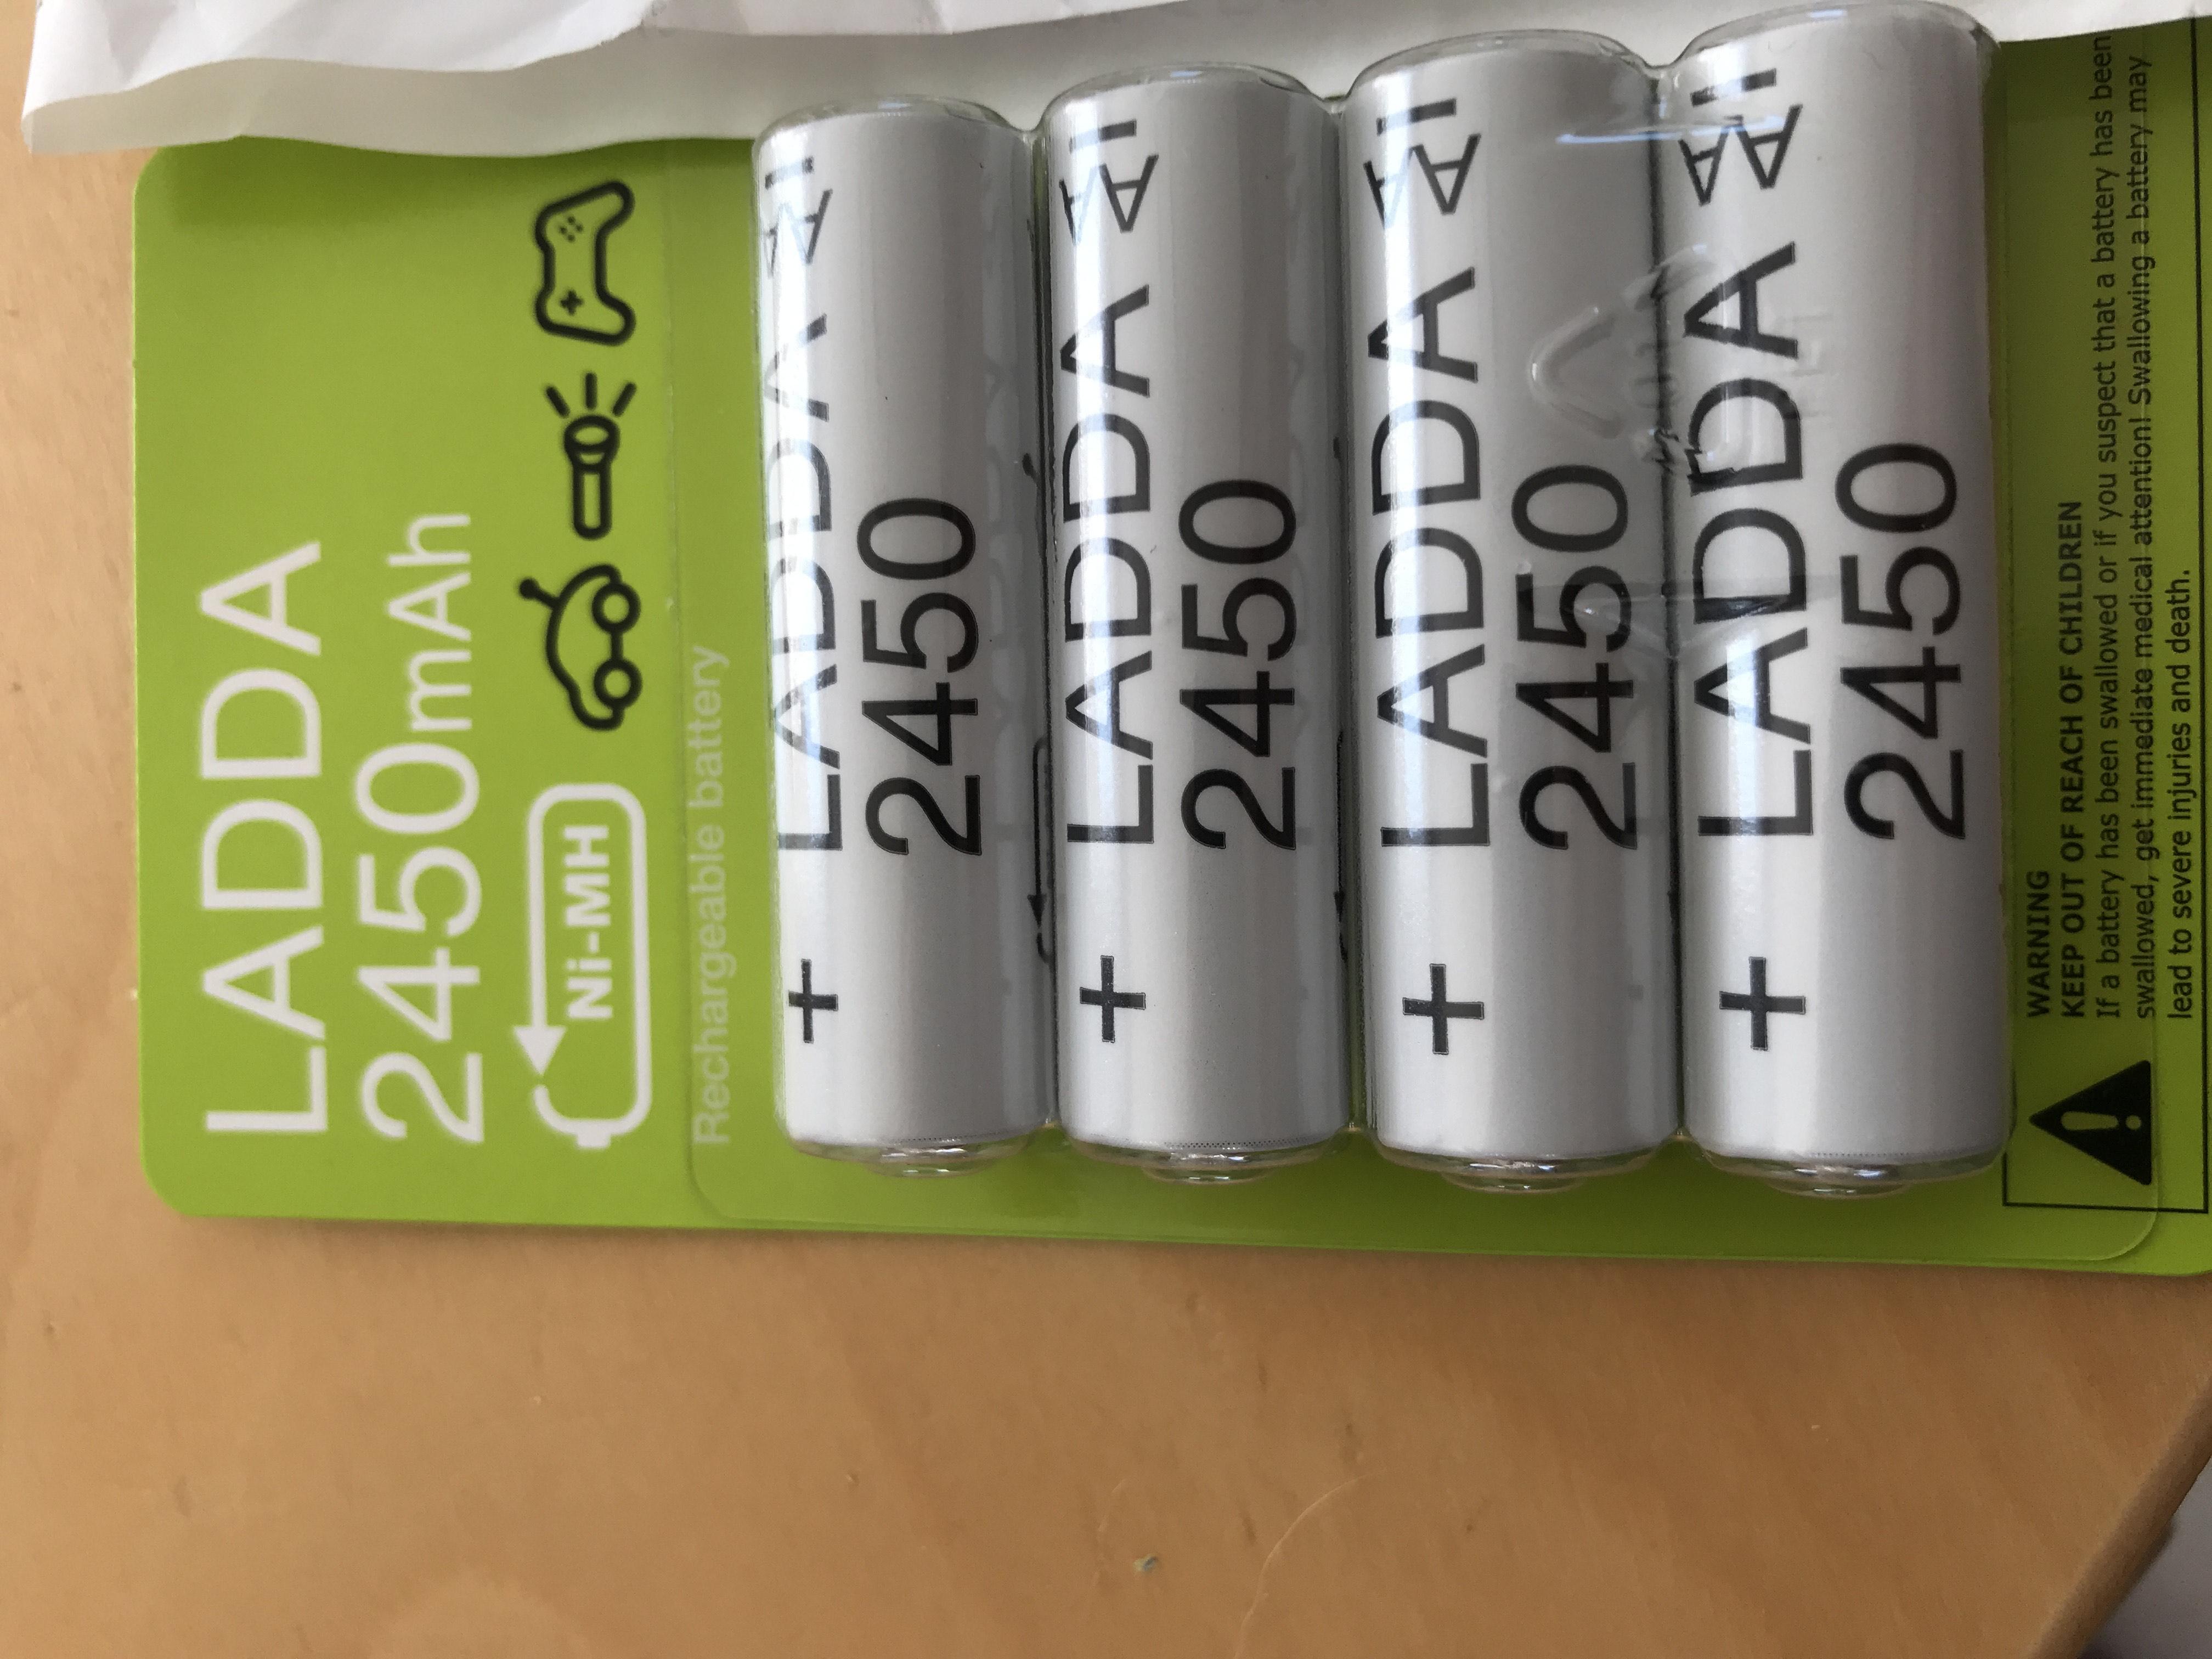 [Ikea Familty] Lot de 4 Piles rechargeables AAA ou AA Ikea Ladda - Caen (14)